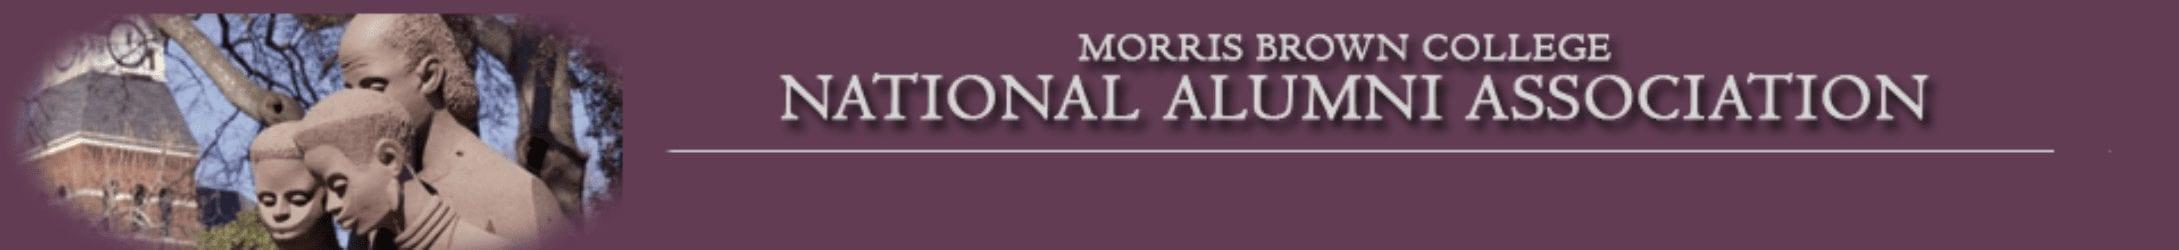 Morris Brown College National Alumni Association